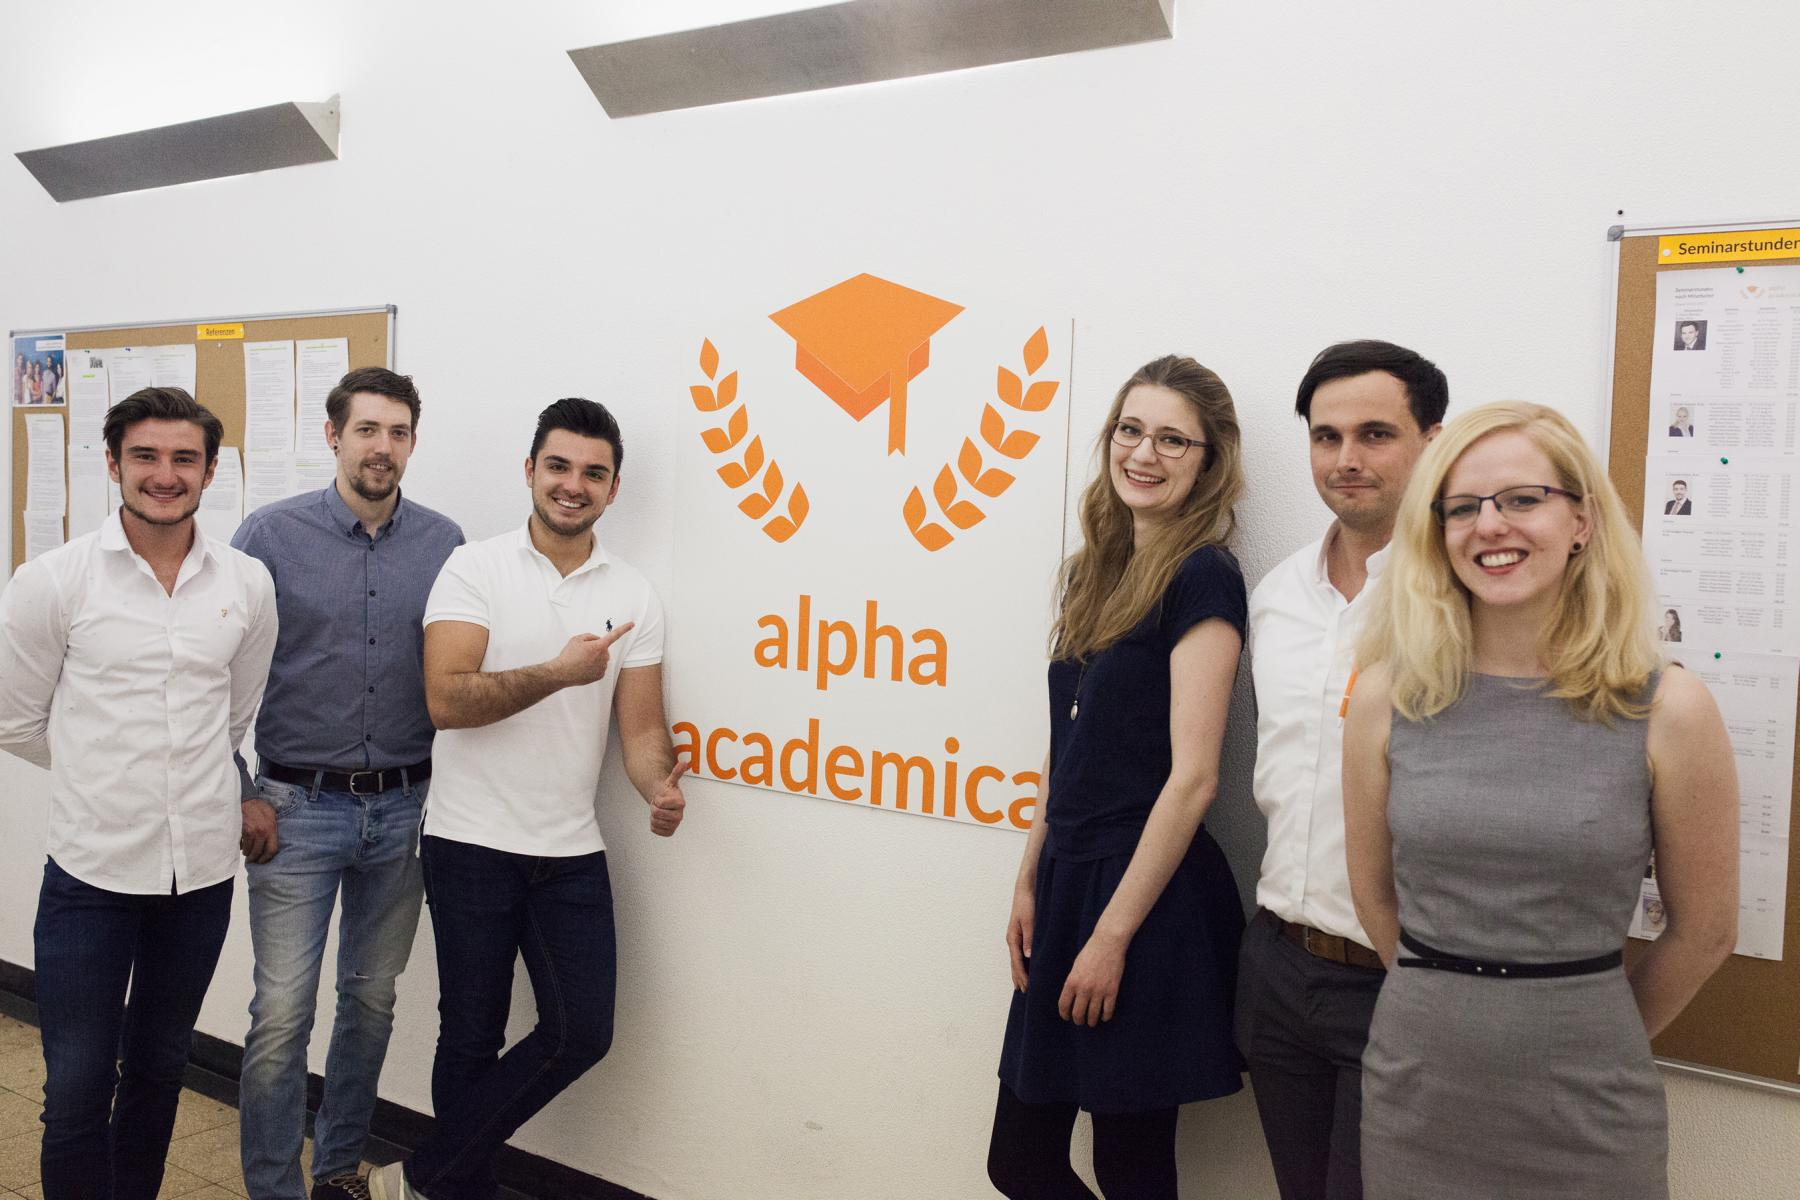 alpha academica